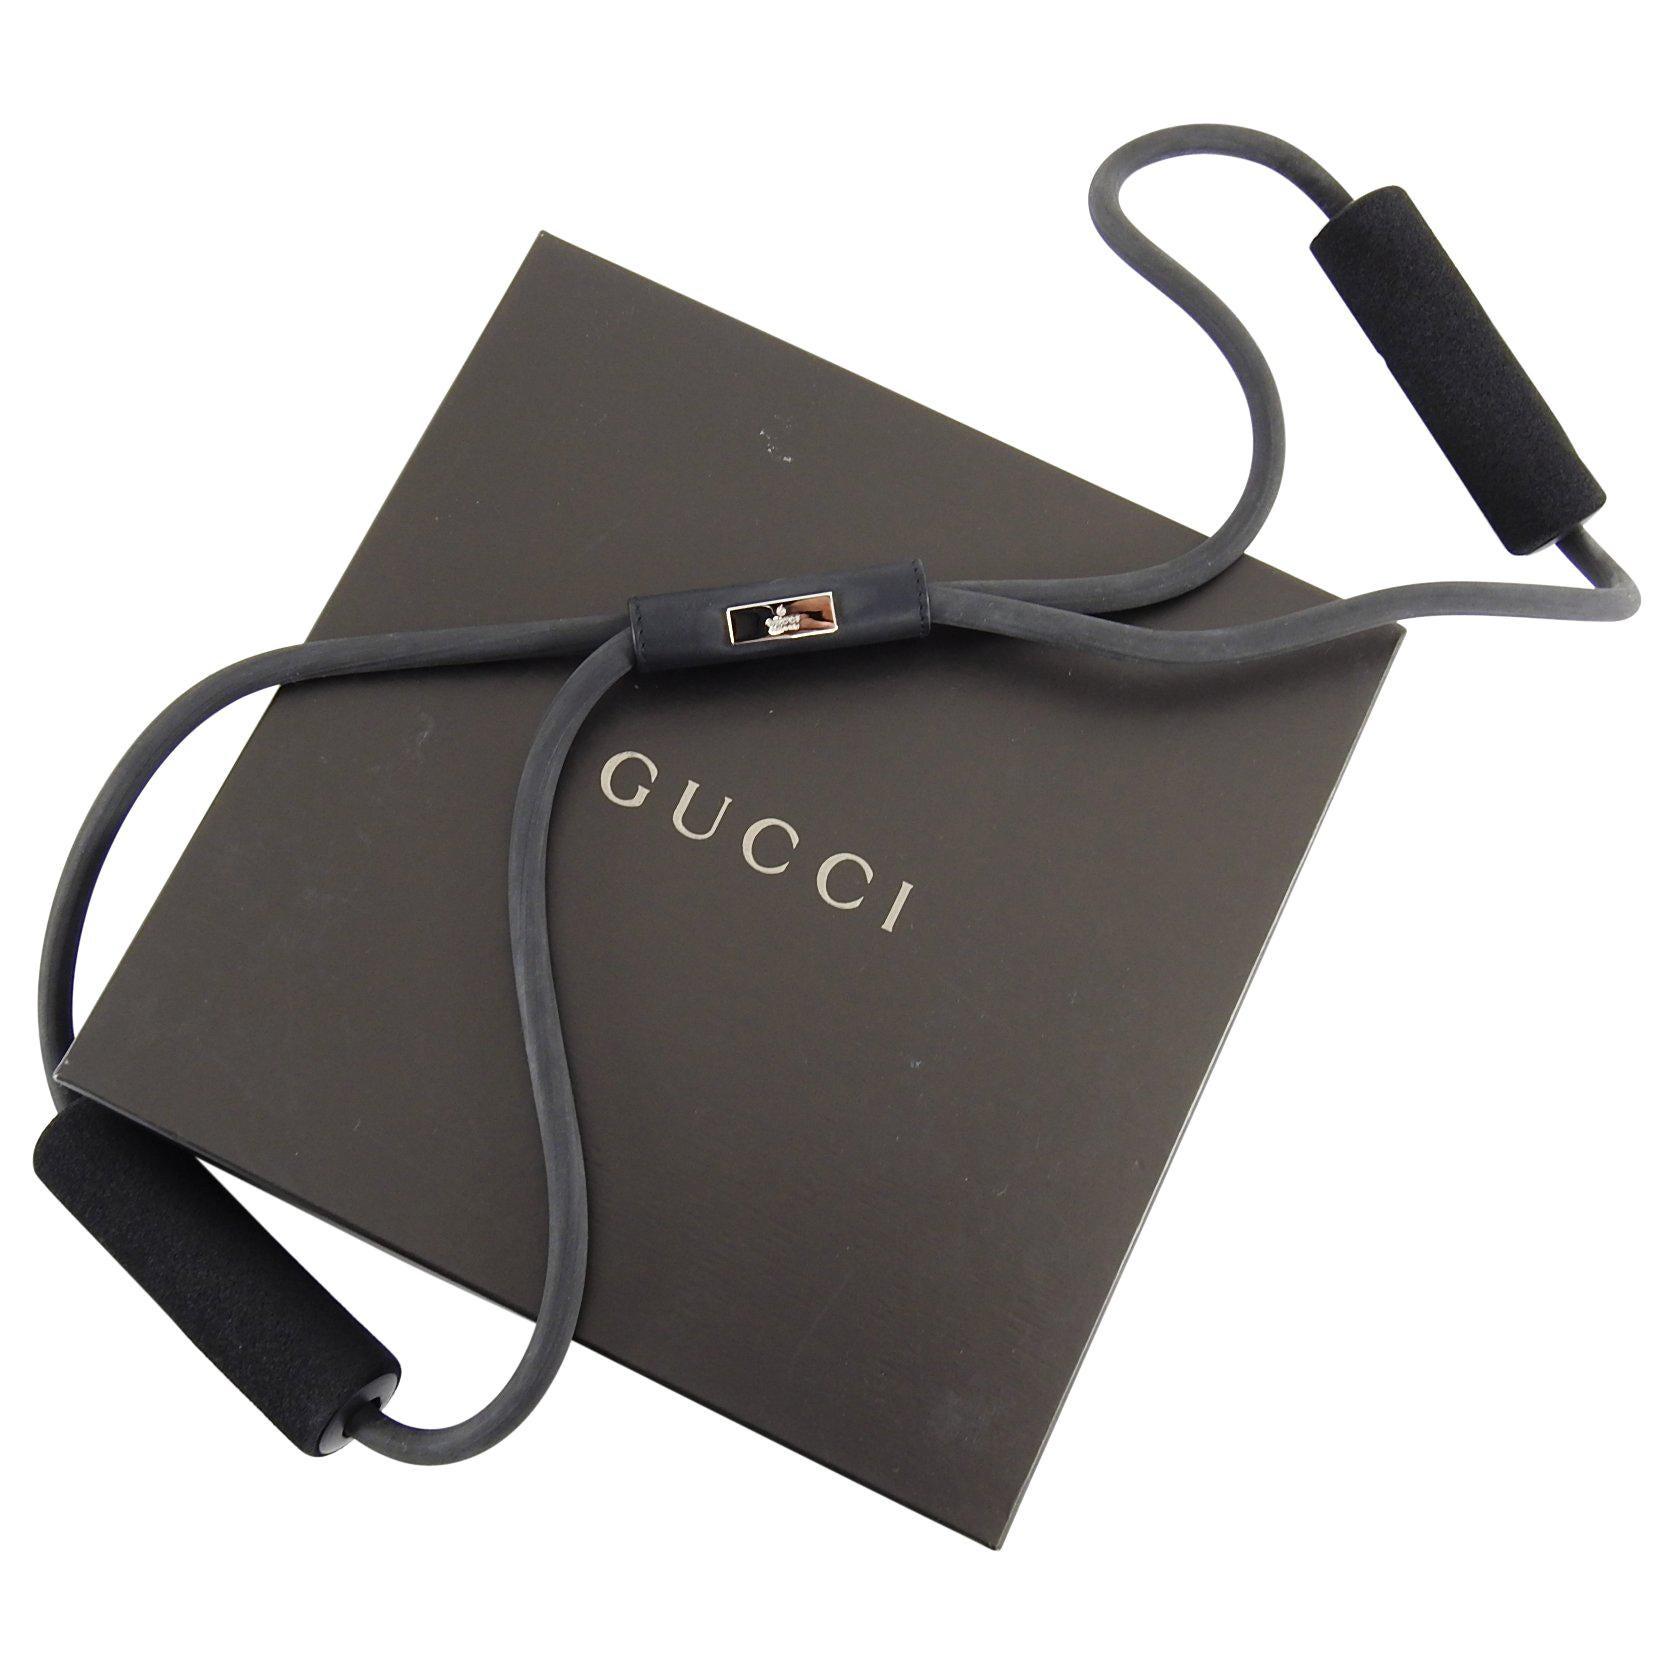 458ac1e04b6 Vintage Gucci Ephemera - 59 For Sale at 1stdibs